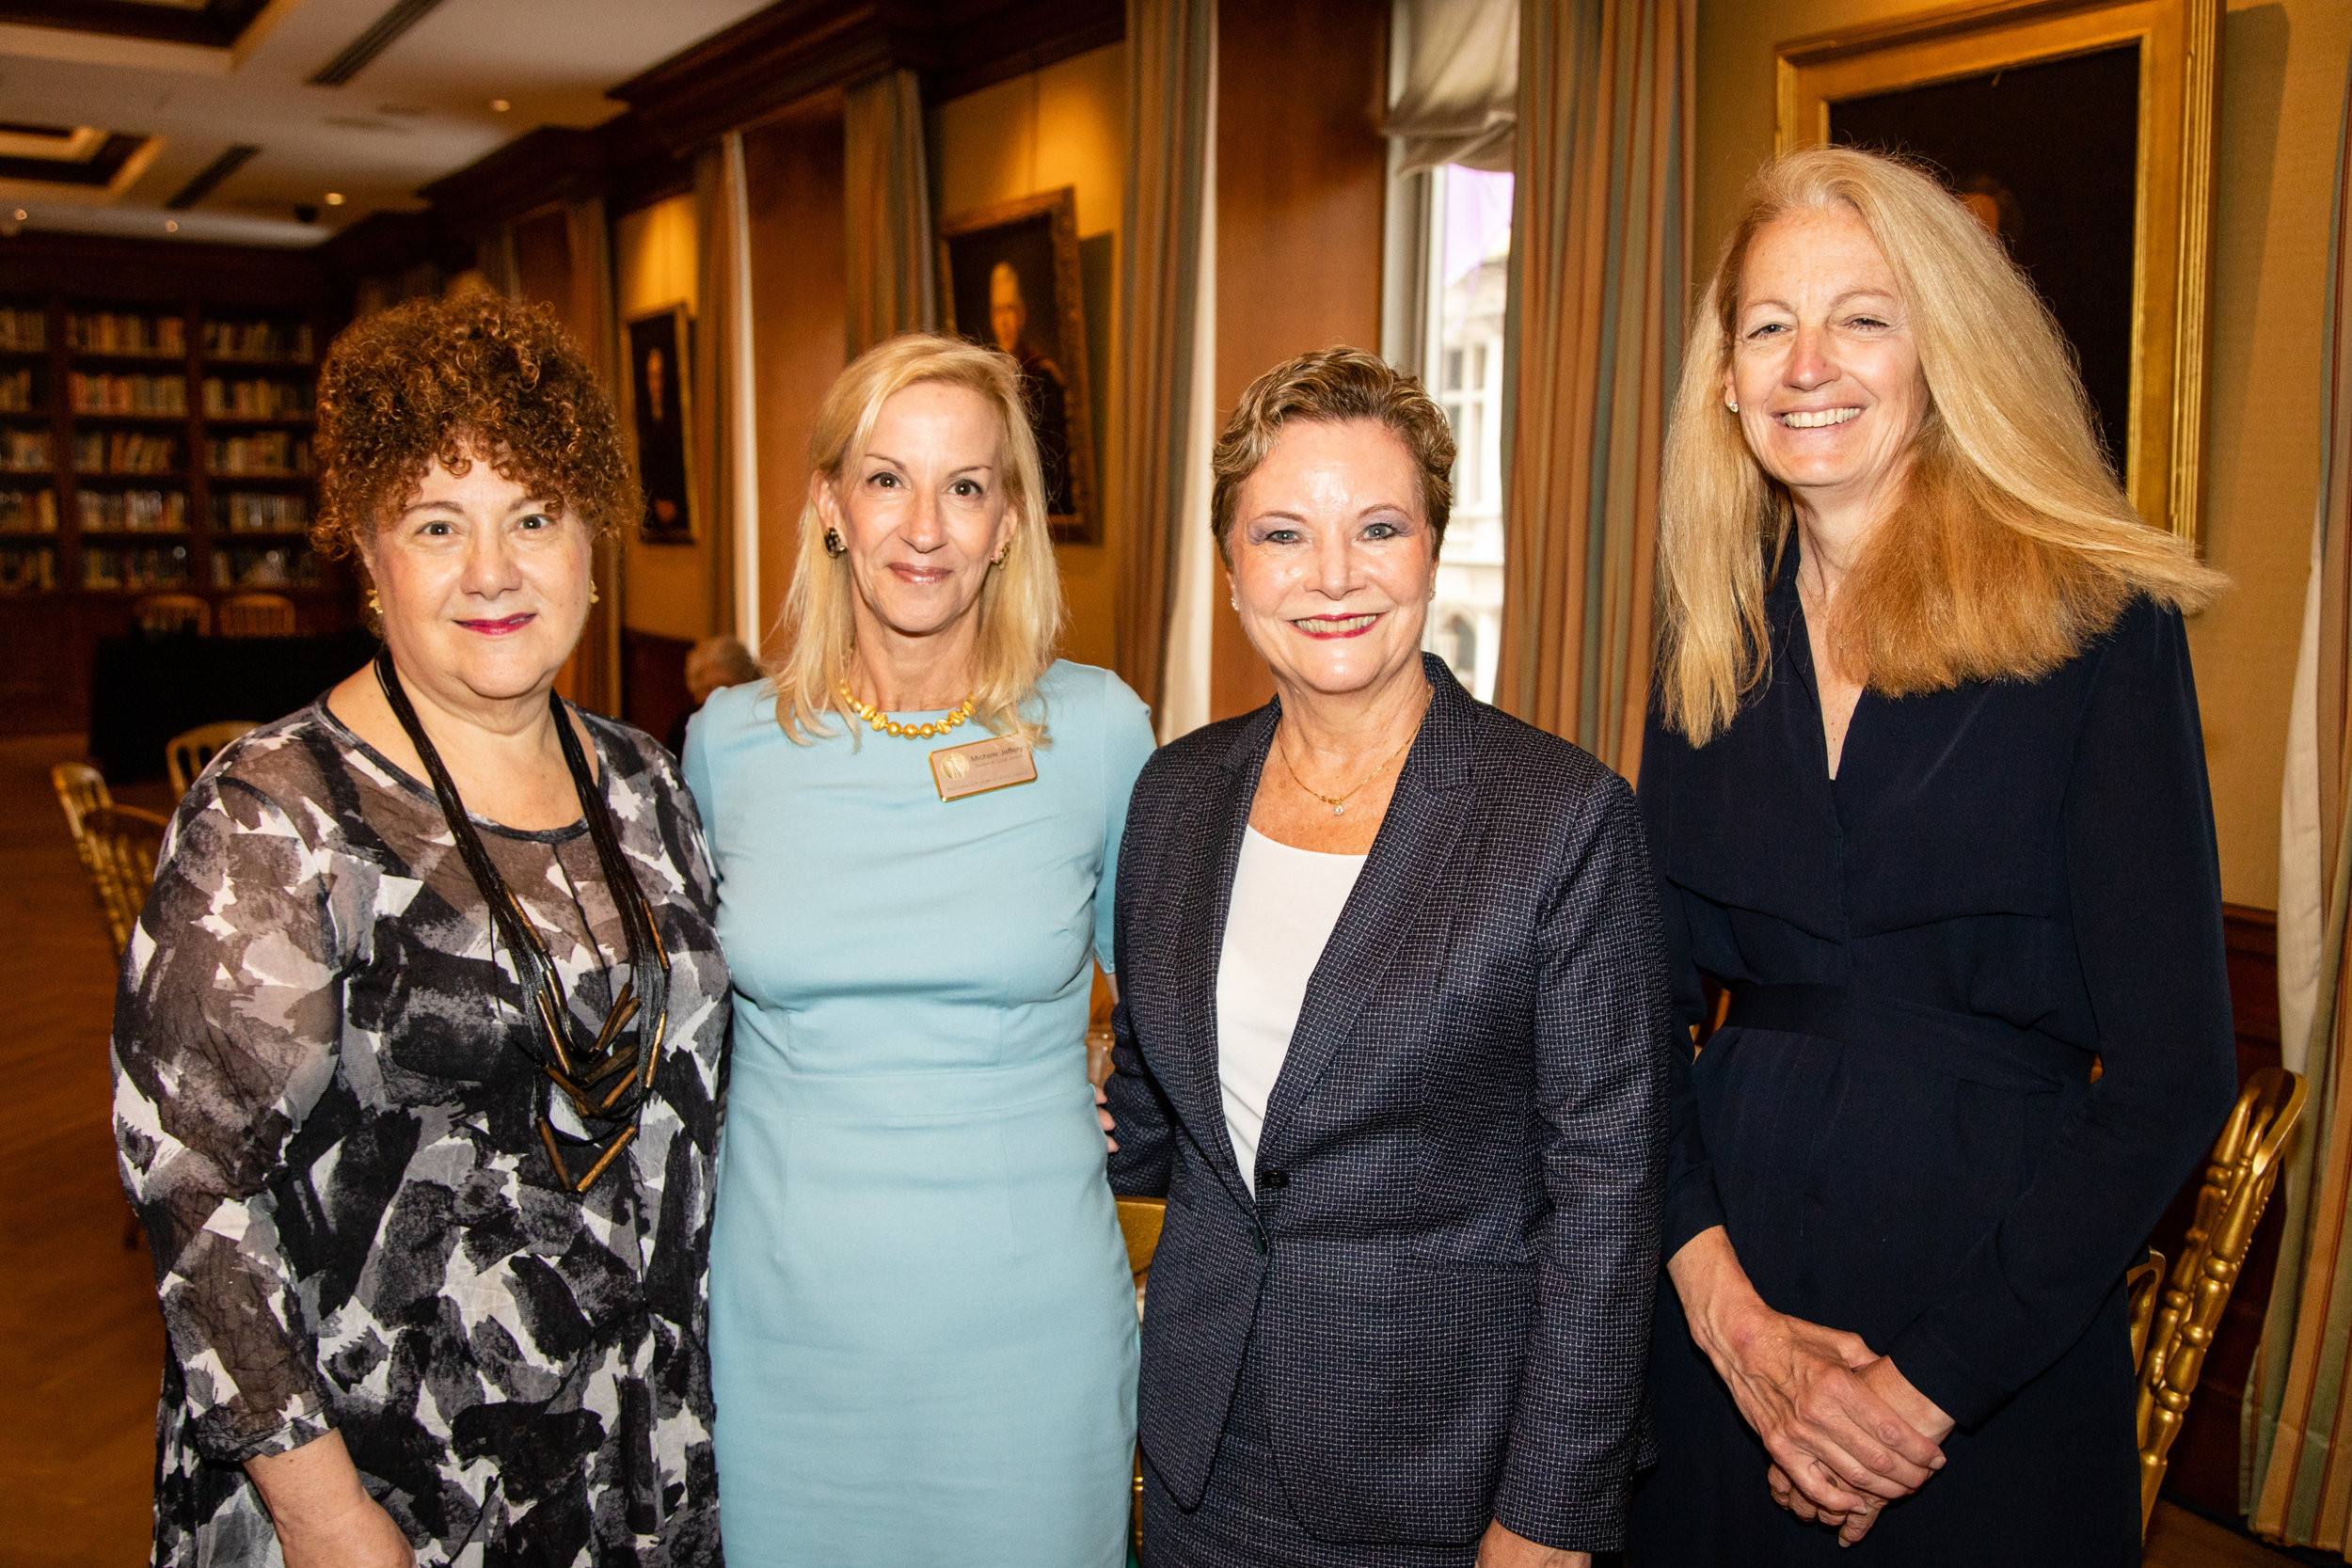 Susan Holliday, Michele Jeffery, Elaine Rosenblum, Colleen Pizzitola